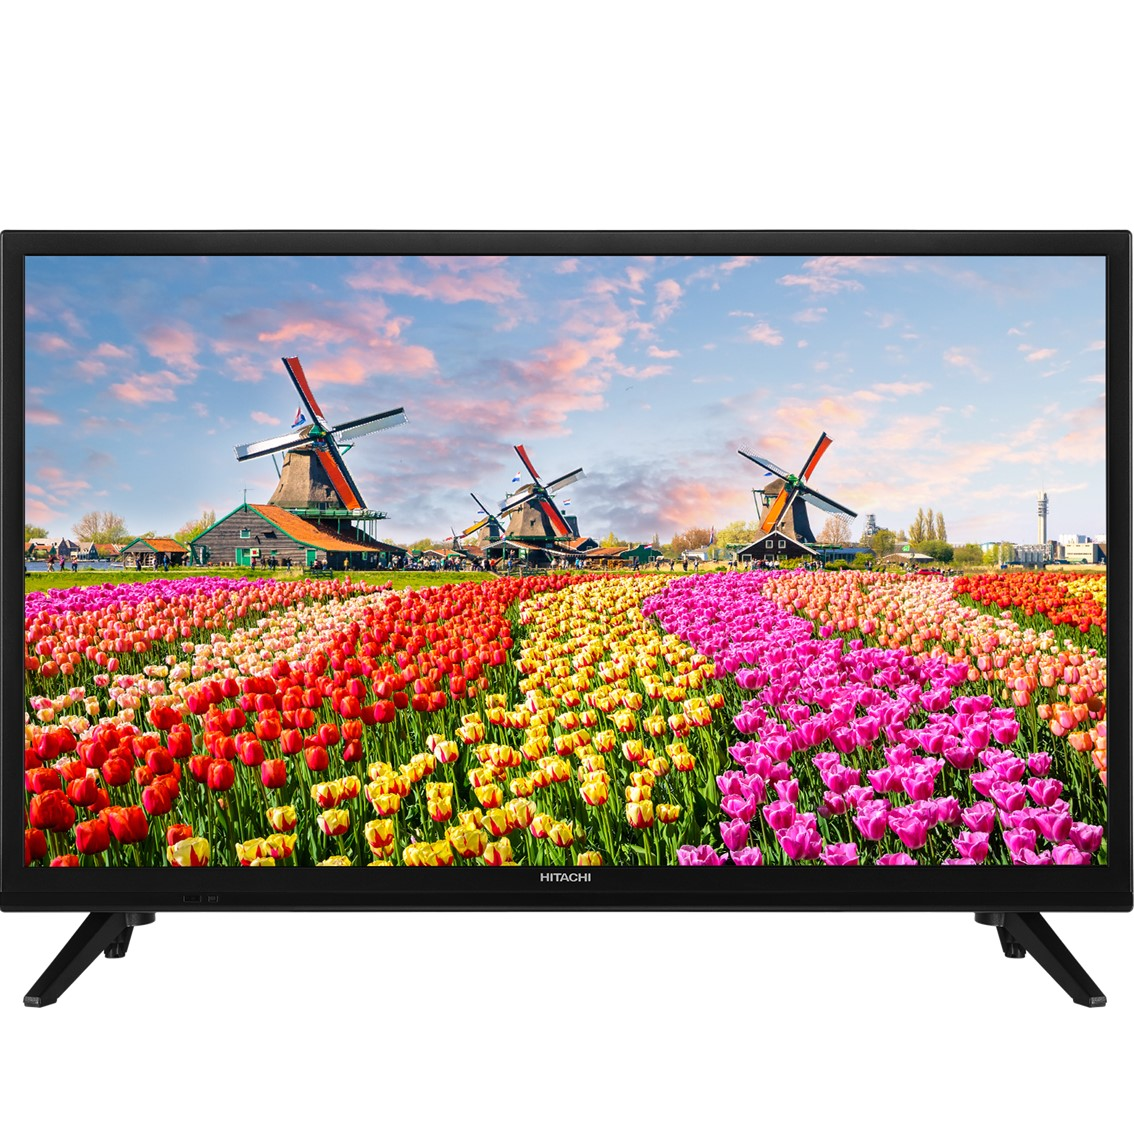 Tv hitachi 24pulgadas led hd -  24hae2250 - android smart tv -  3 hdmi -  2 usb -  bluetooth -  tdt2 -  satelite 2